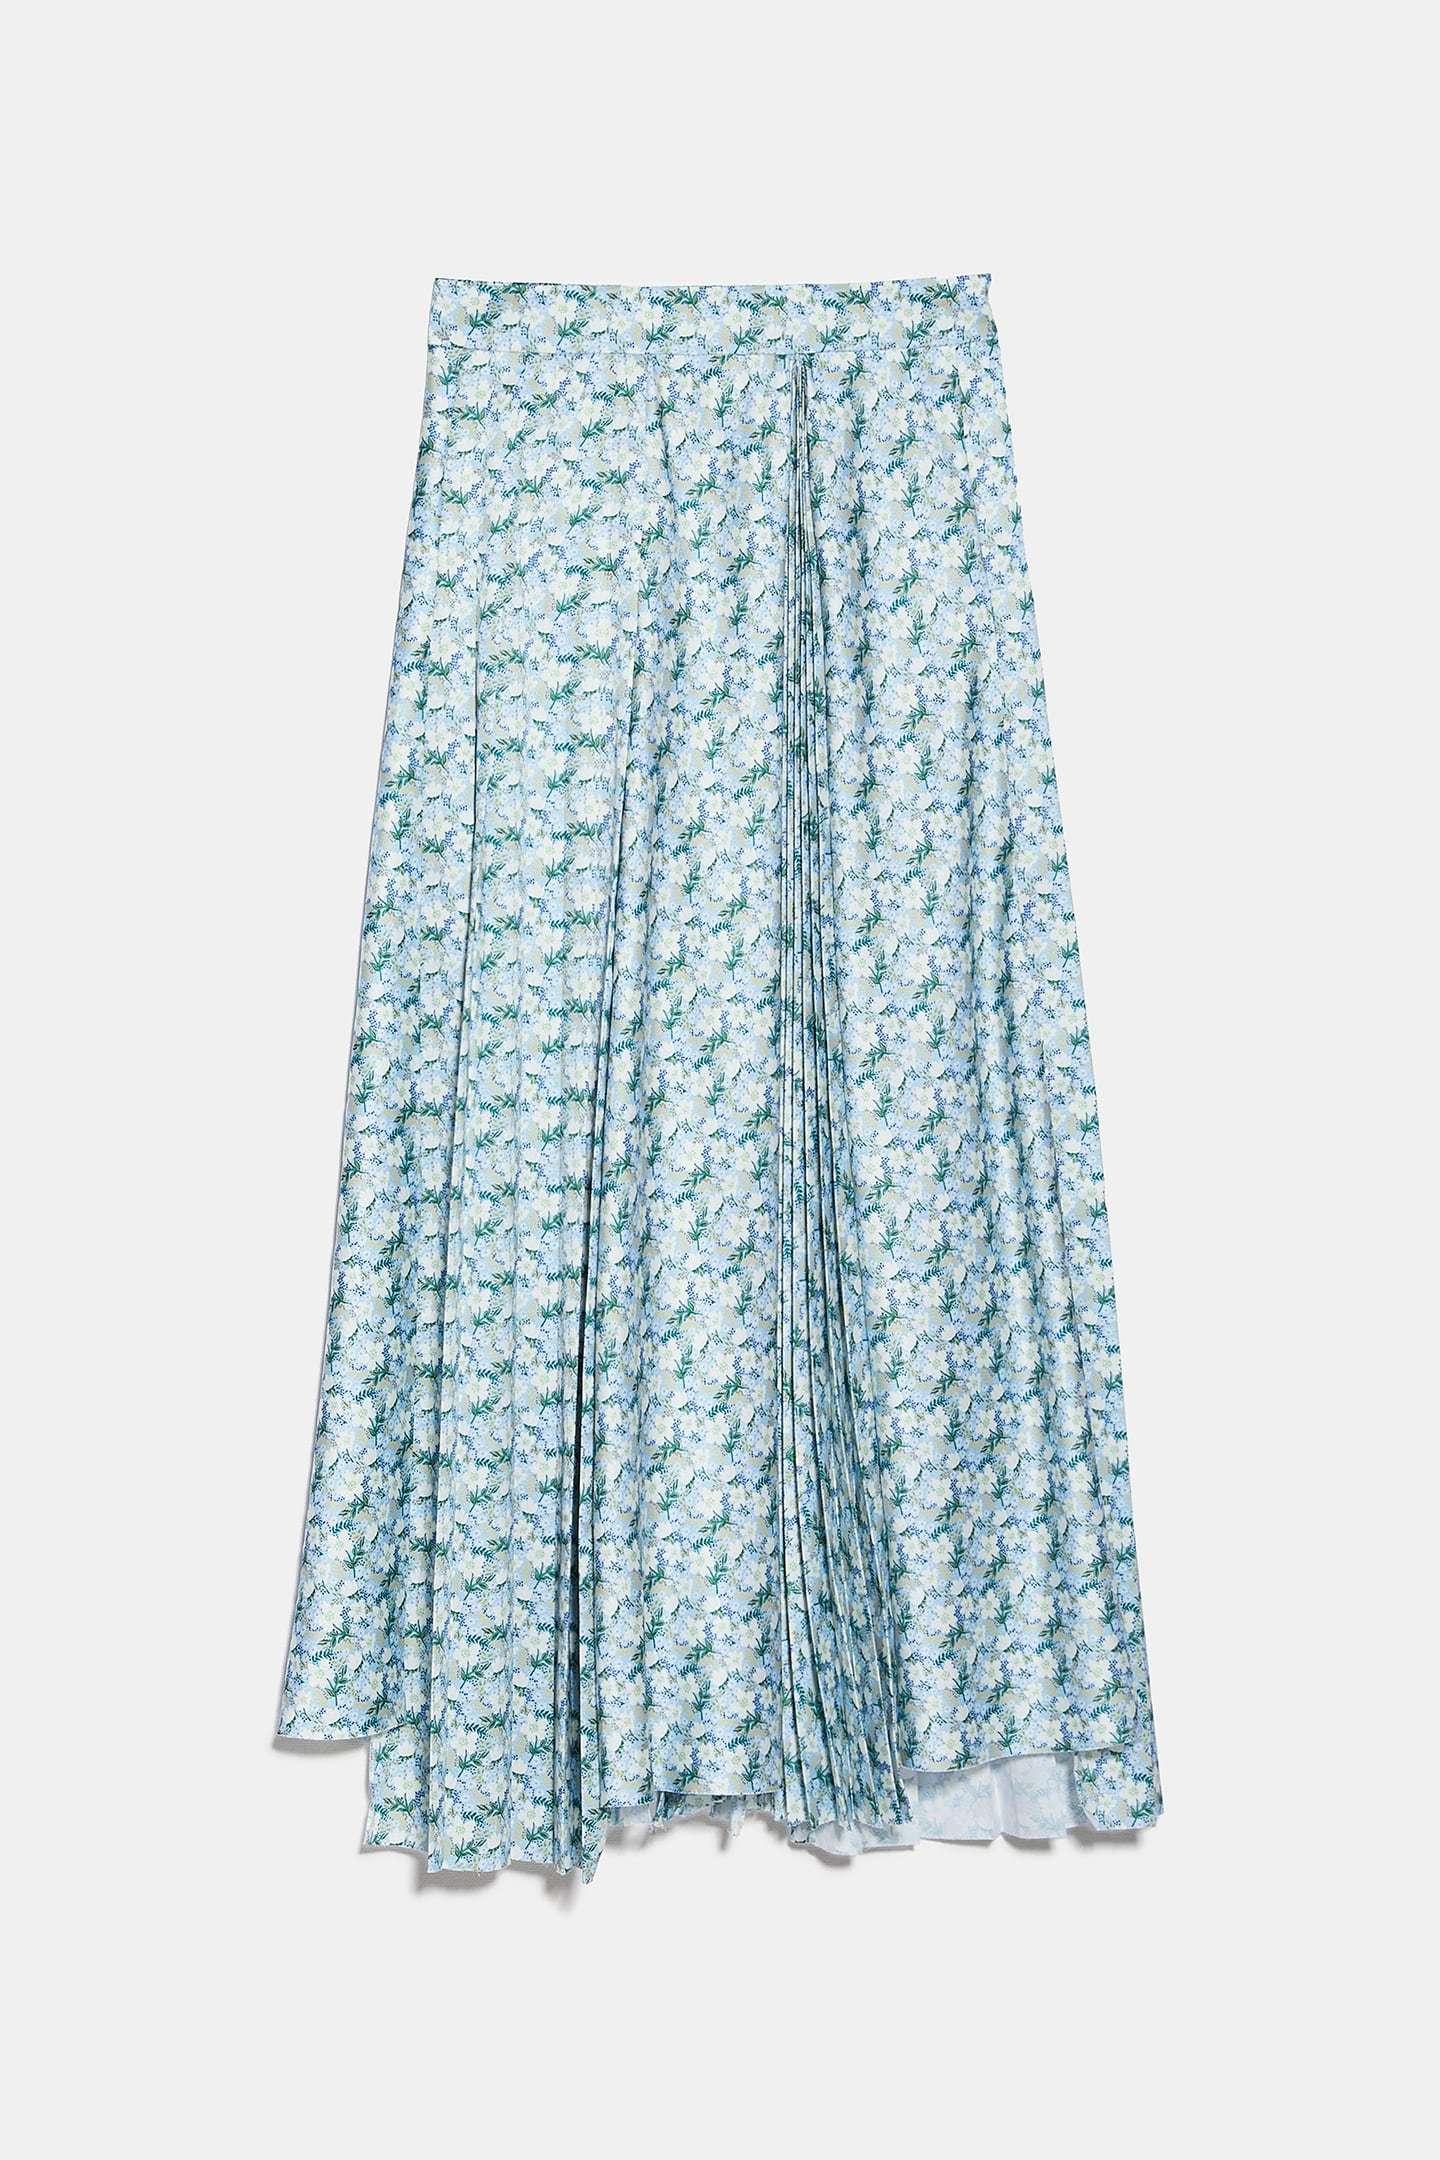 Falda de Zara (49,95 euros).